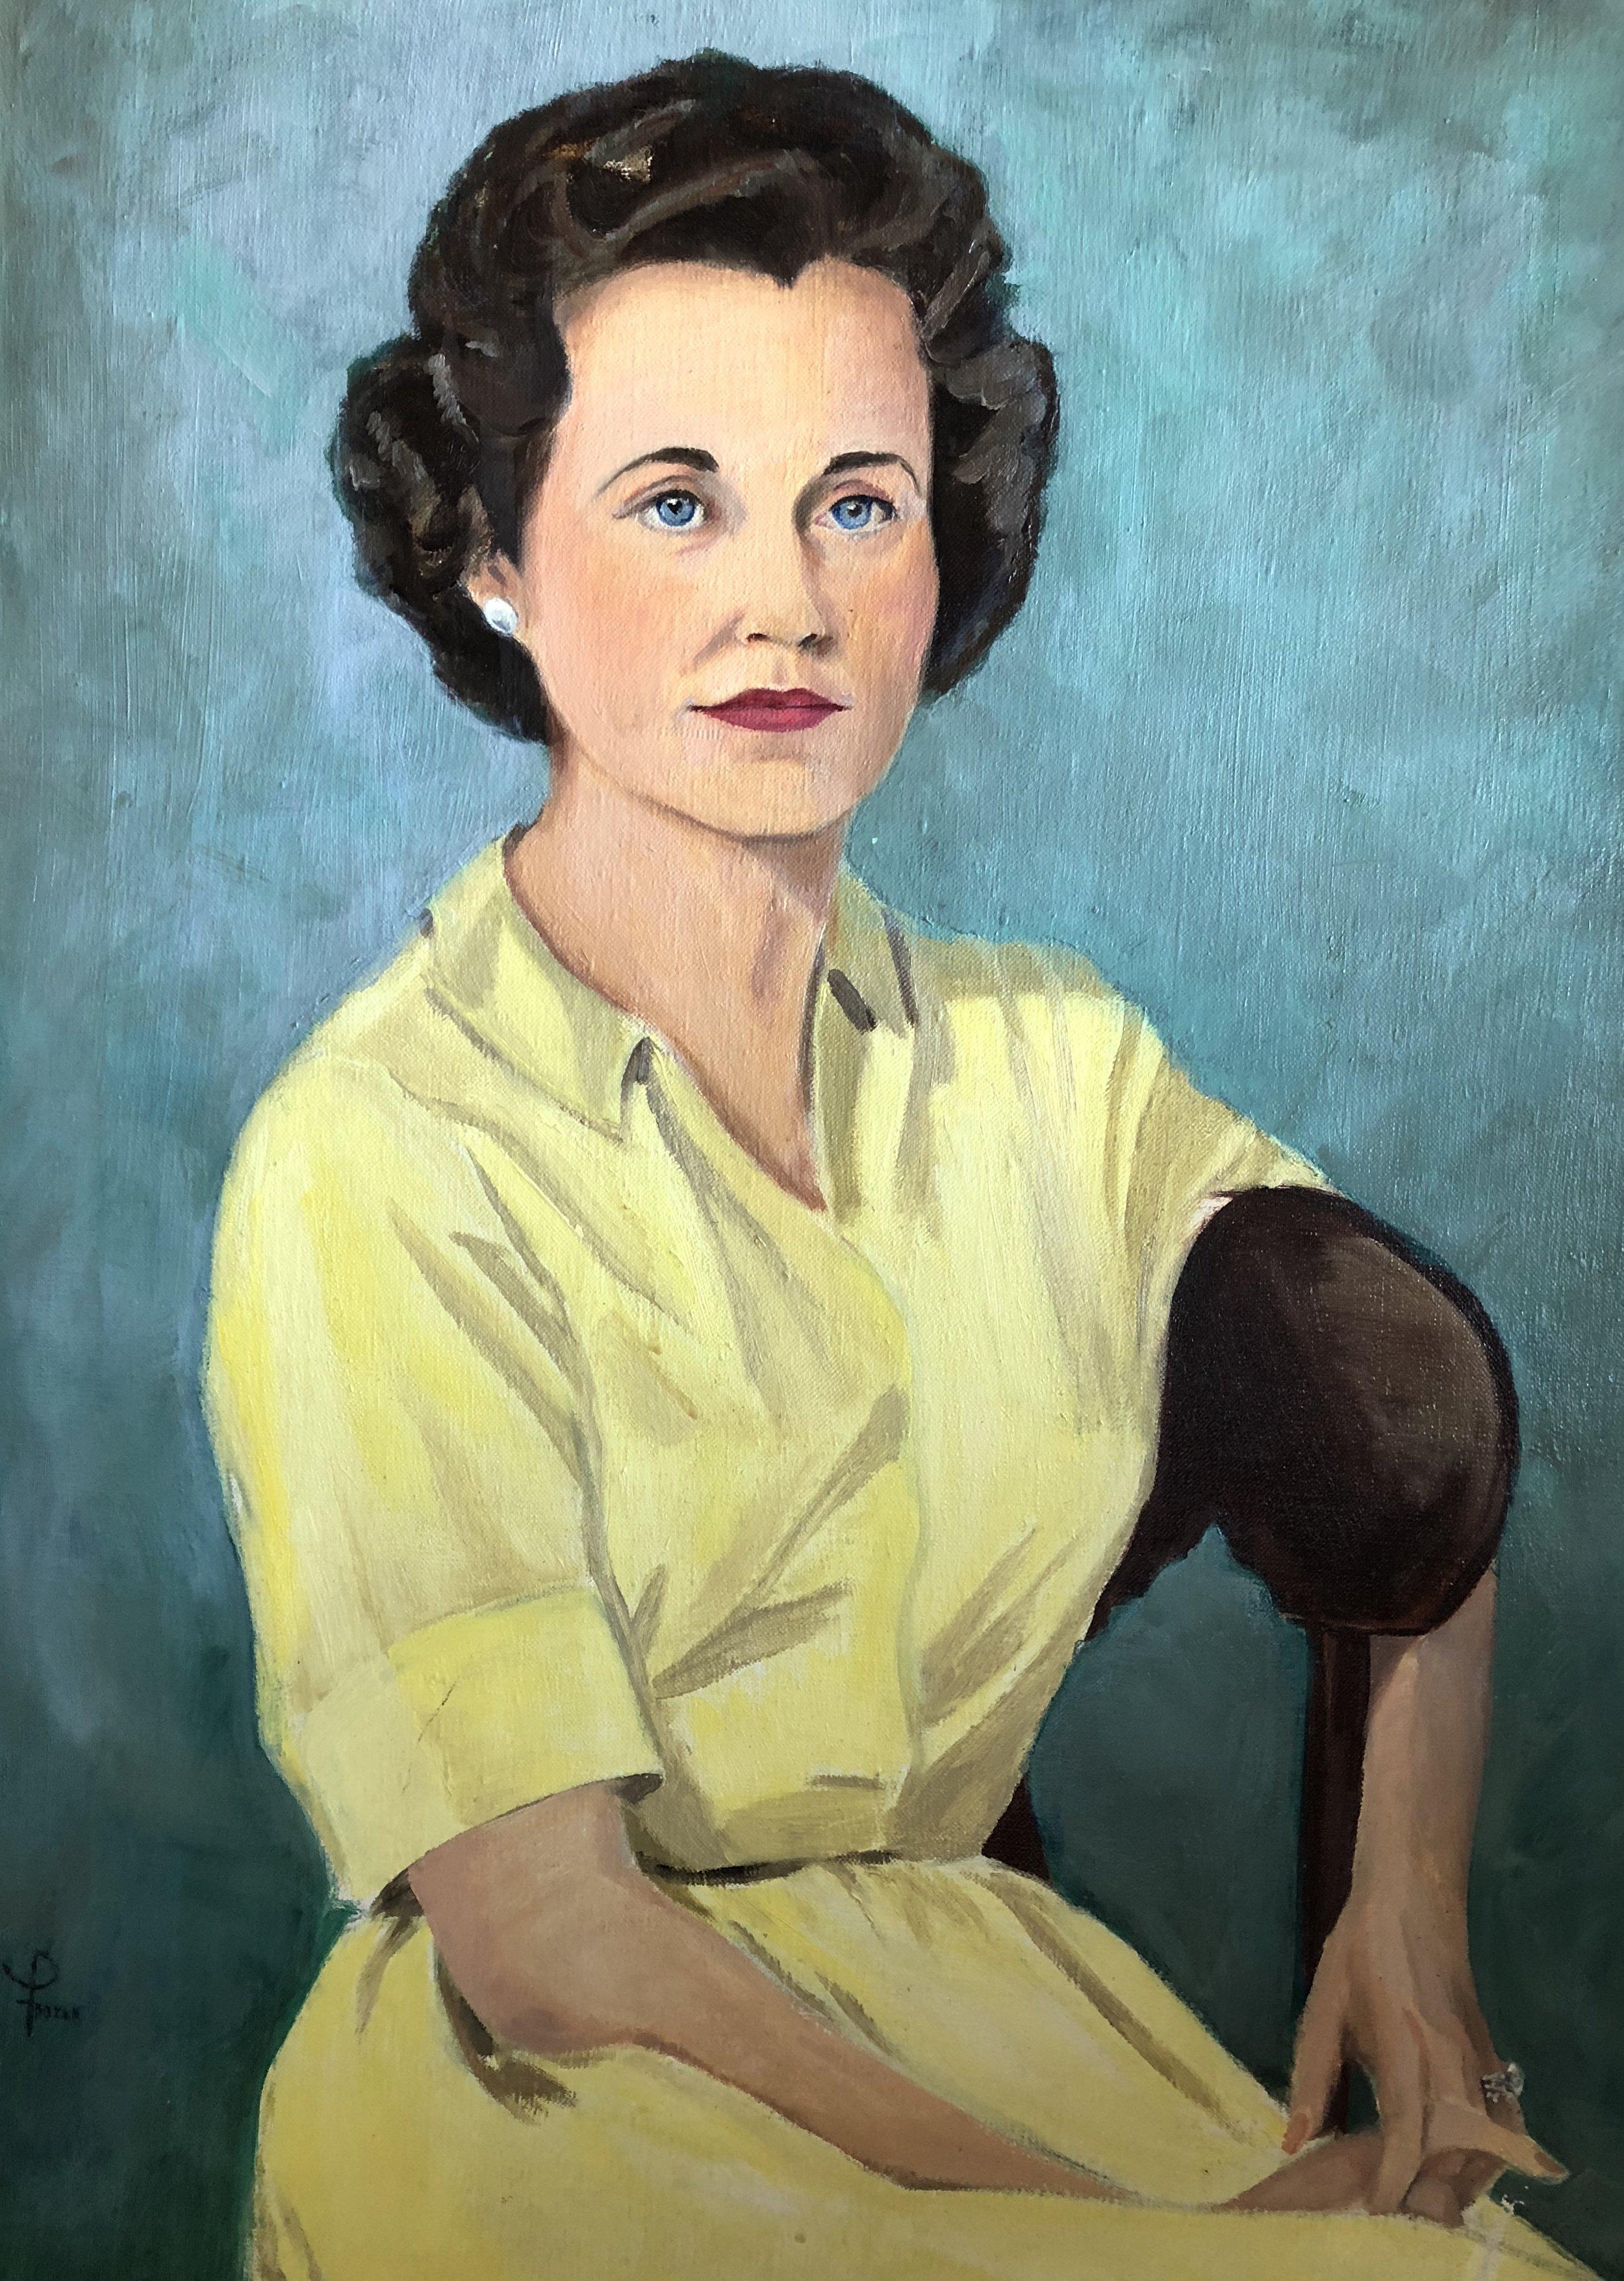 Nana, my paternal grandmother, painted by my maternal grandmother.